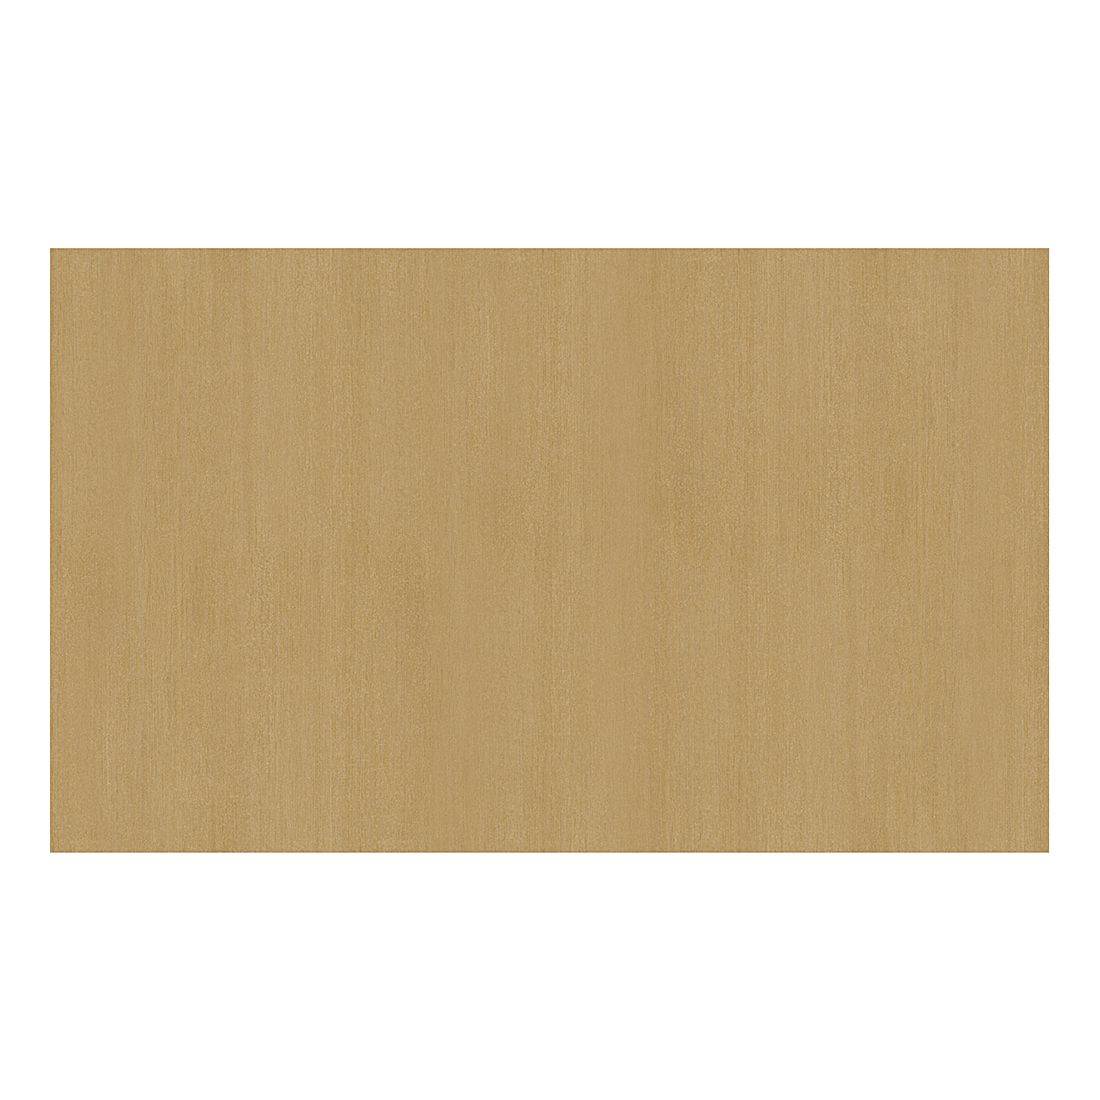 Tapete Bohemian – goldfarben – glatt – Modell 2, Home24Deko jetzt kaufen